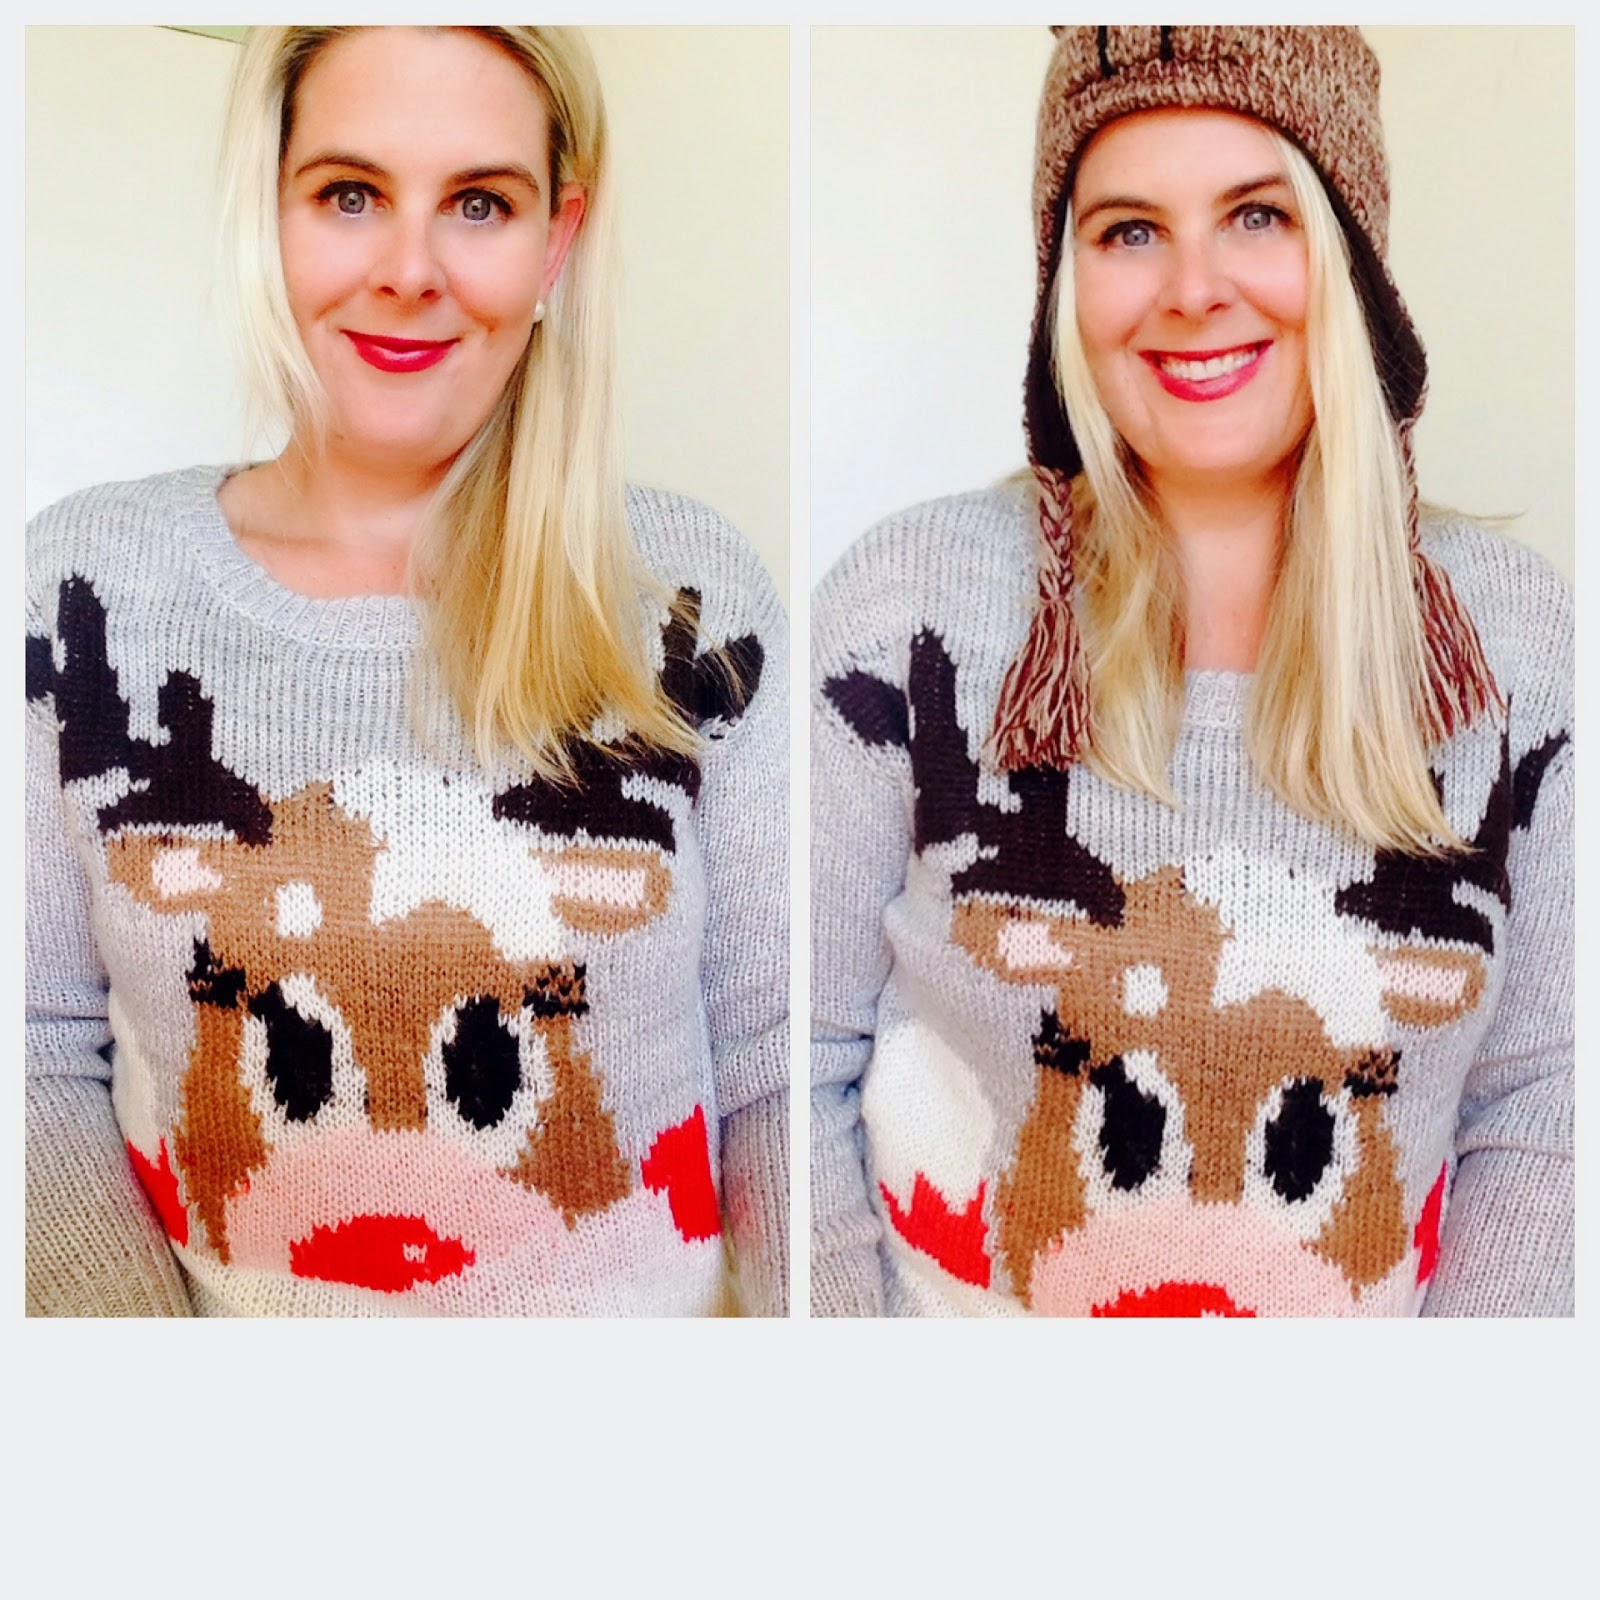 YummoMummo: The Xmas sweater - now stylish! x